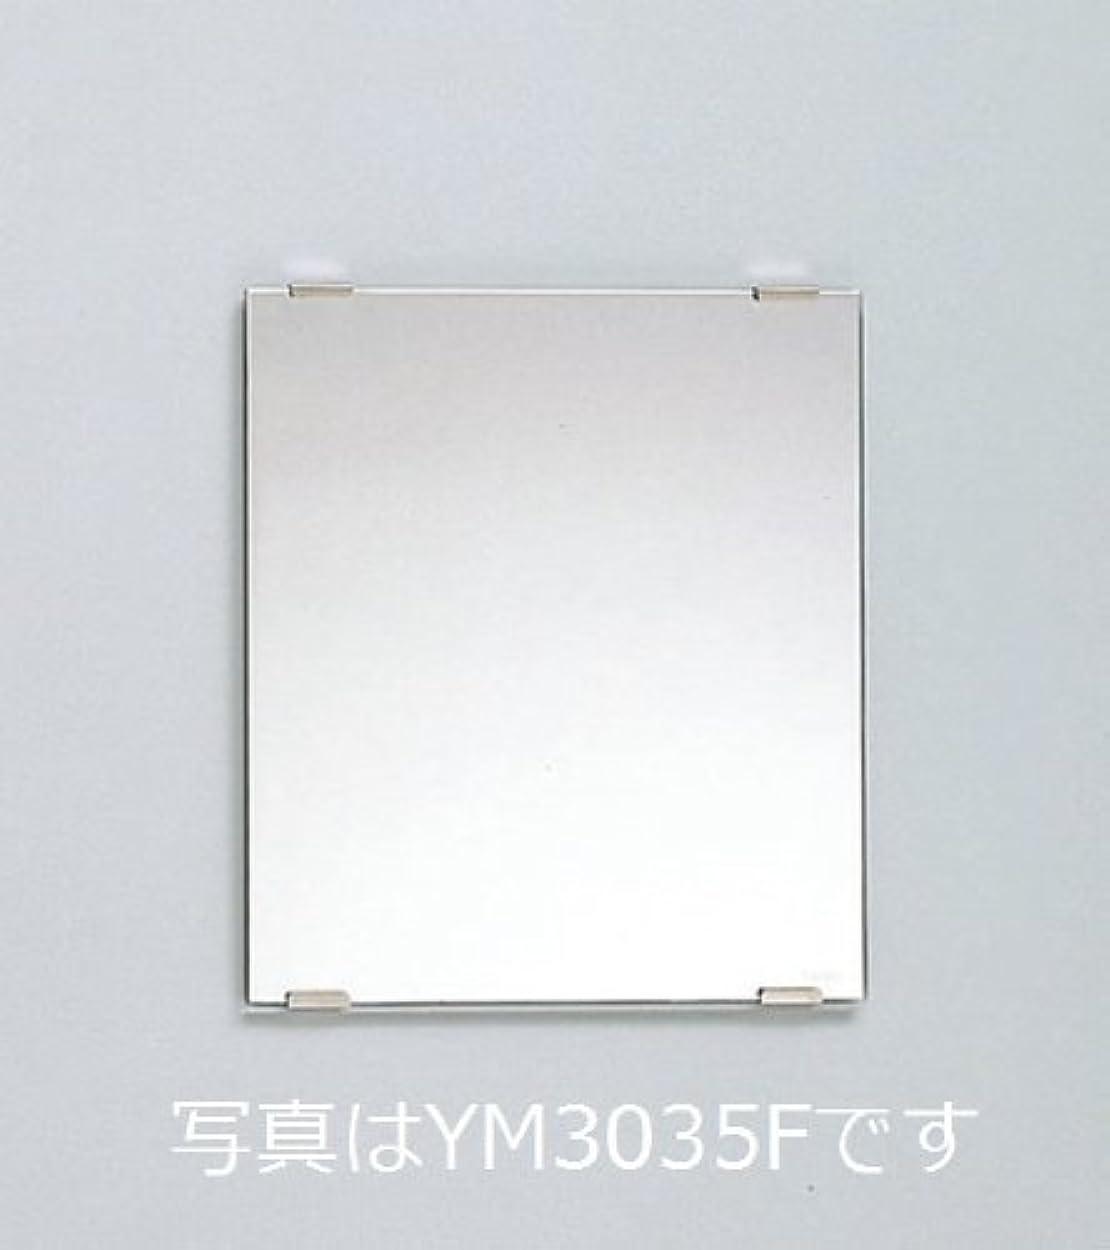 TOTO 化粧鏡 YM3560F 耐食鏡 角型 350×600(mm)